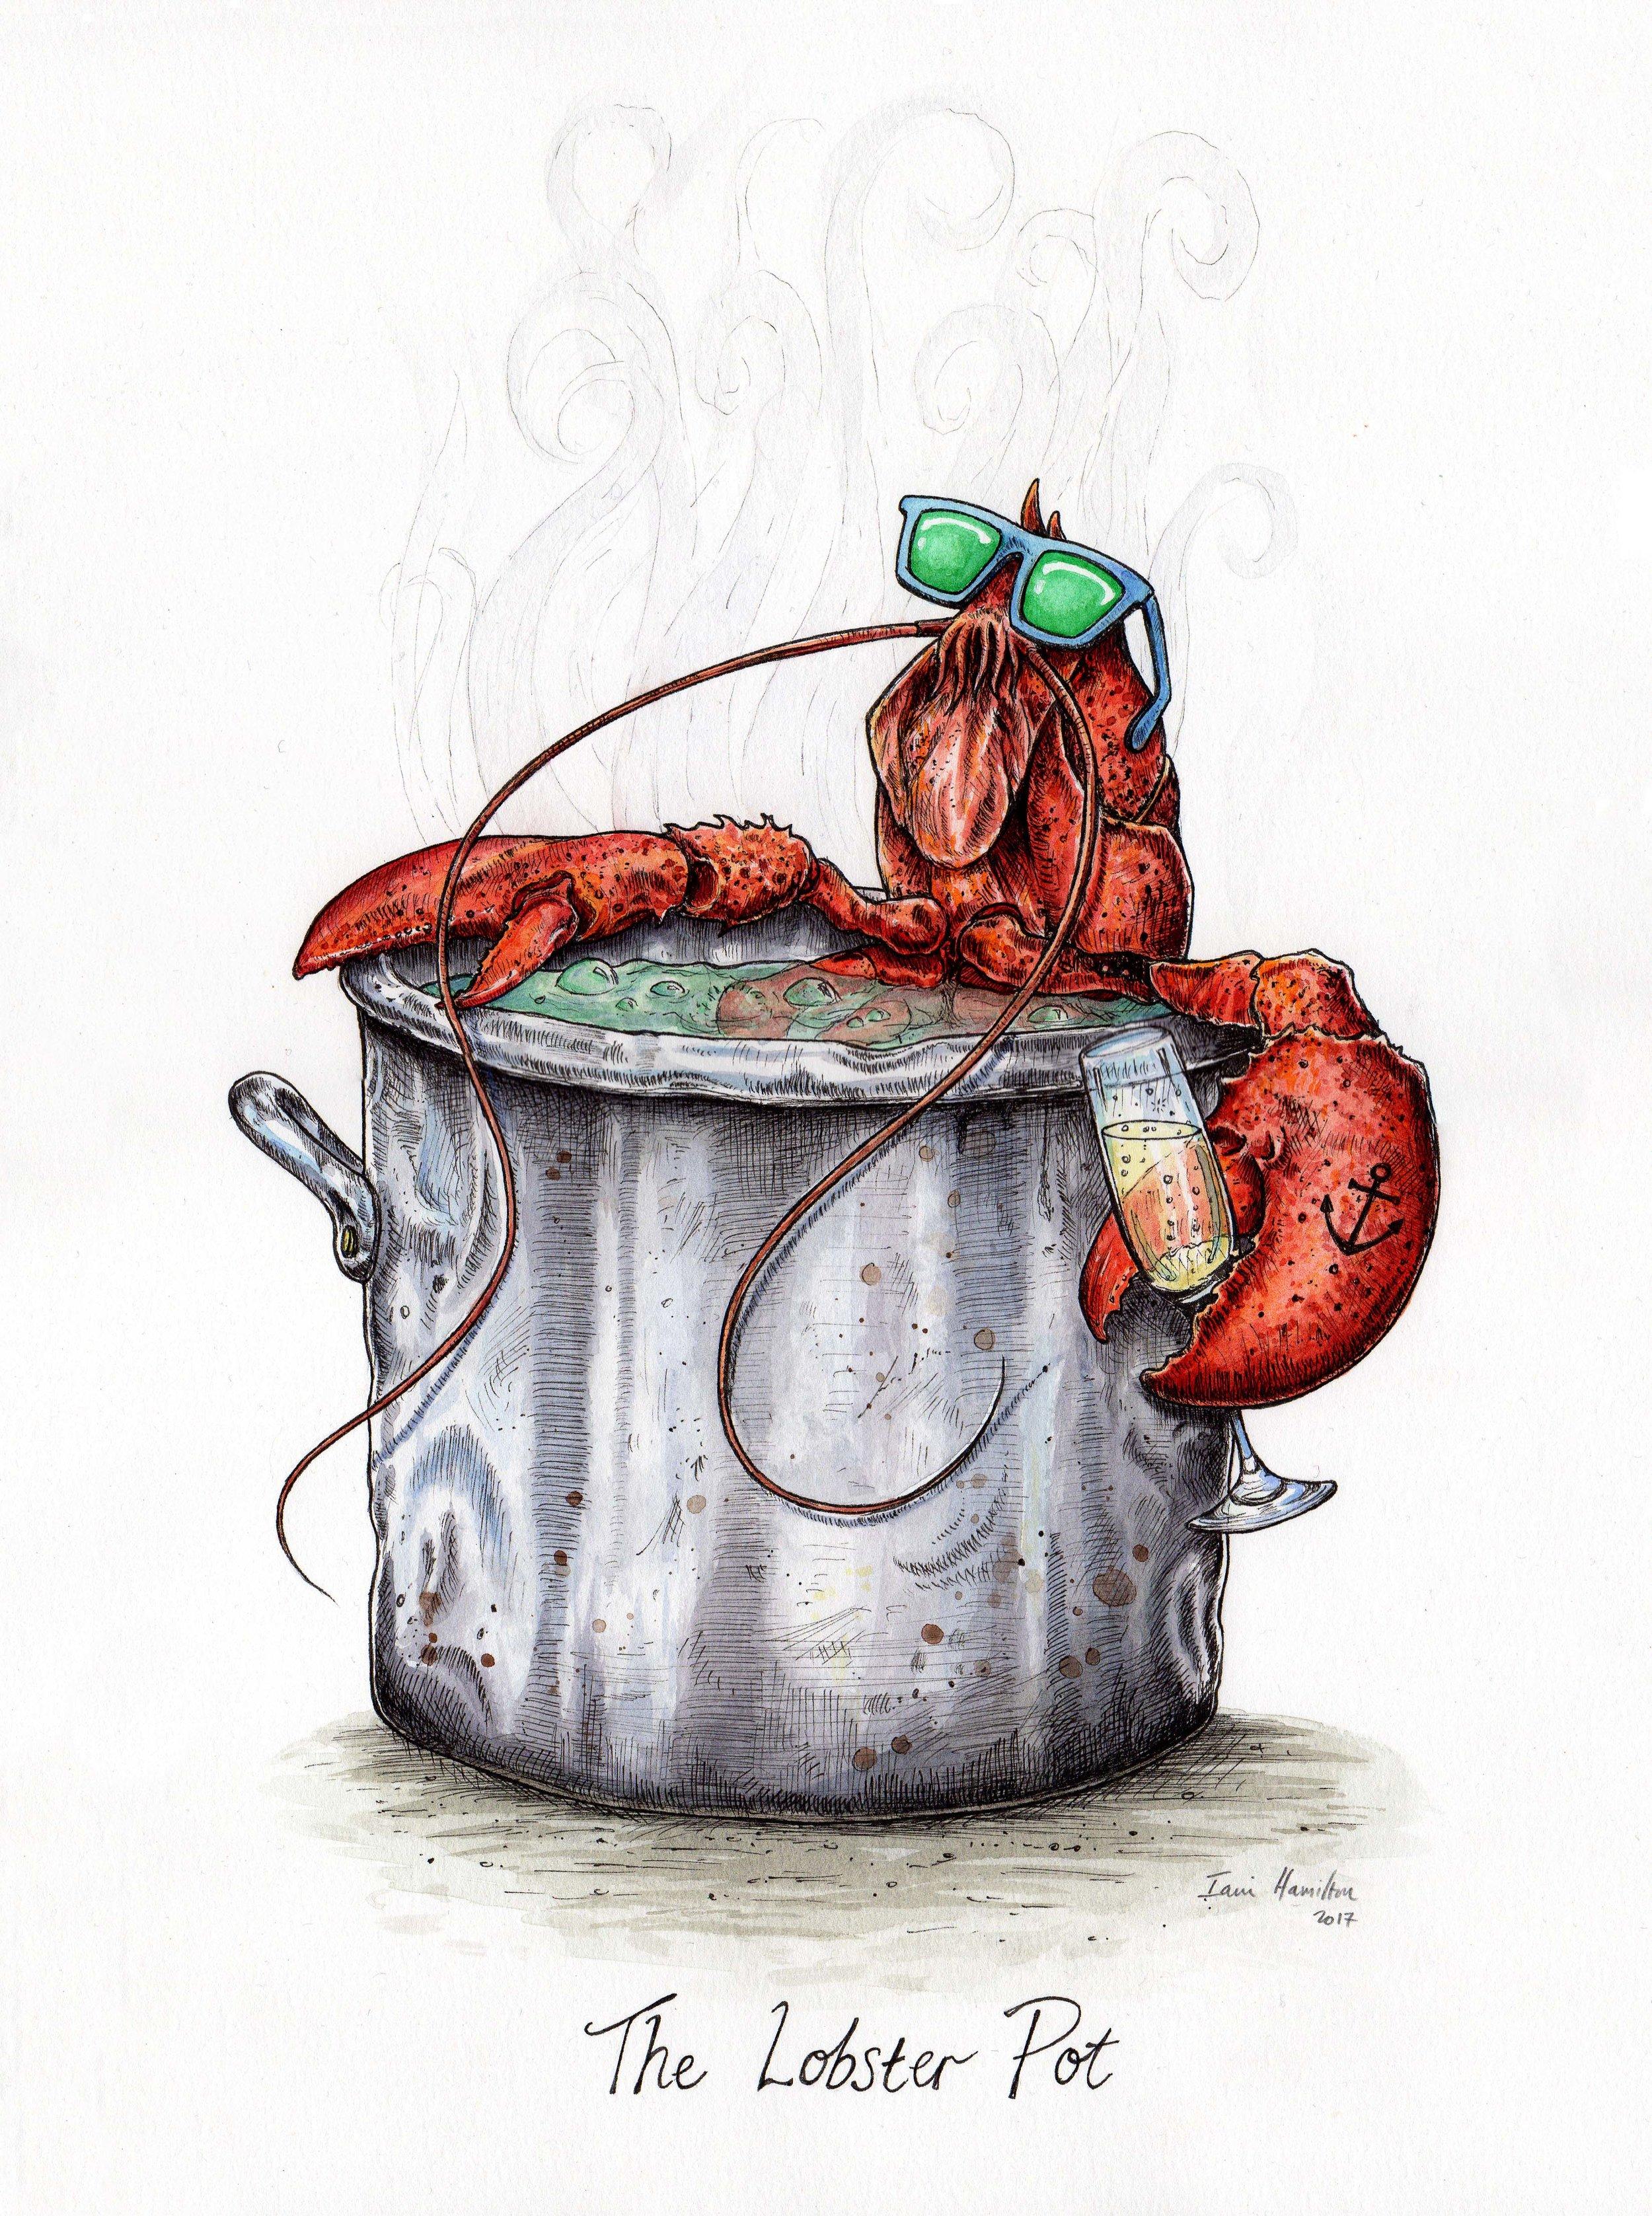 Lobster pot lo res 2.jpg